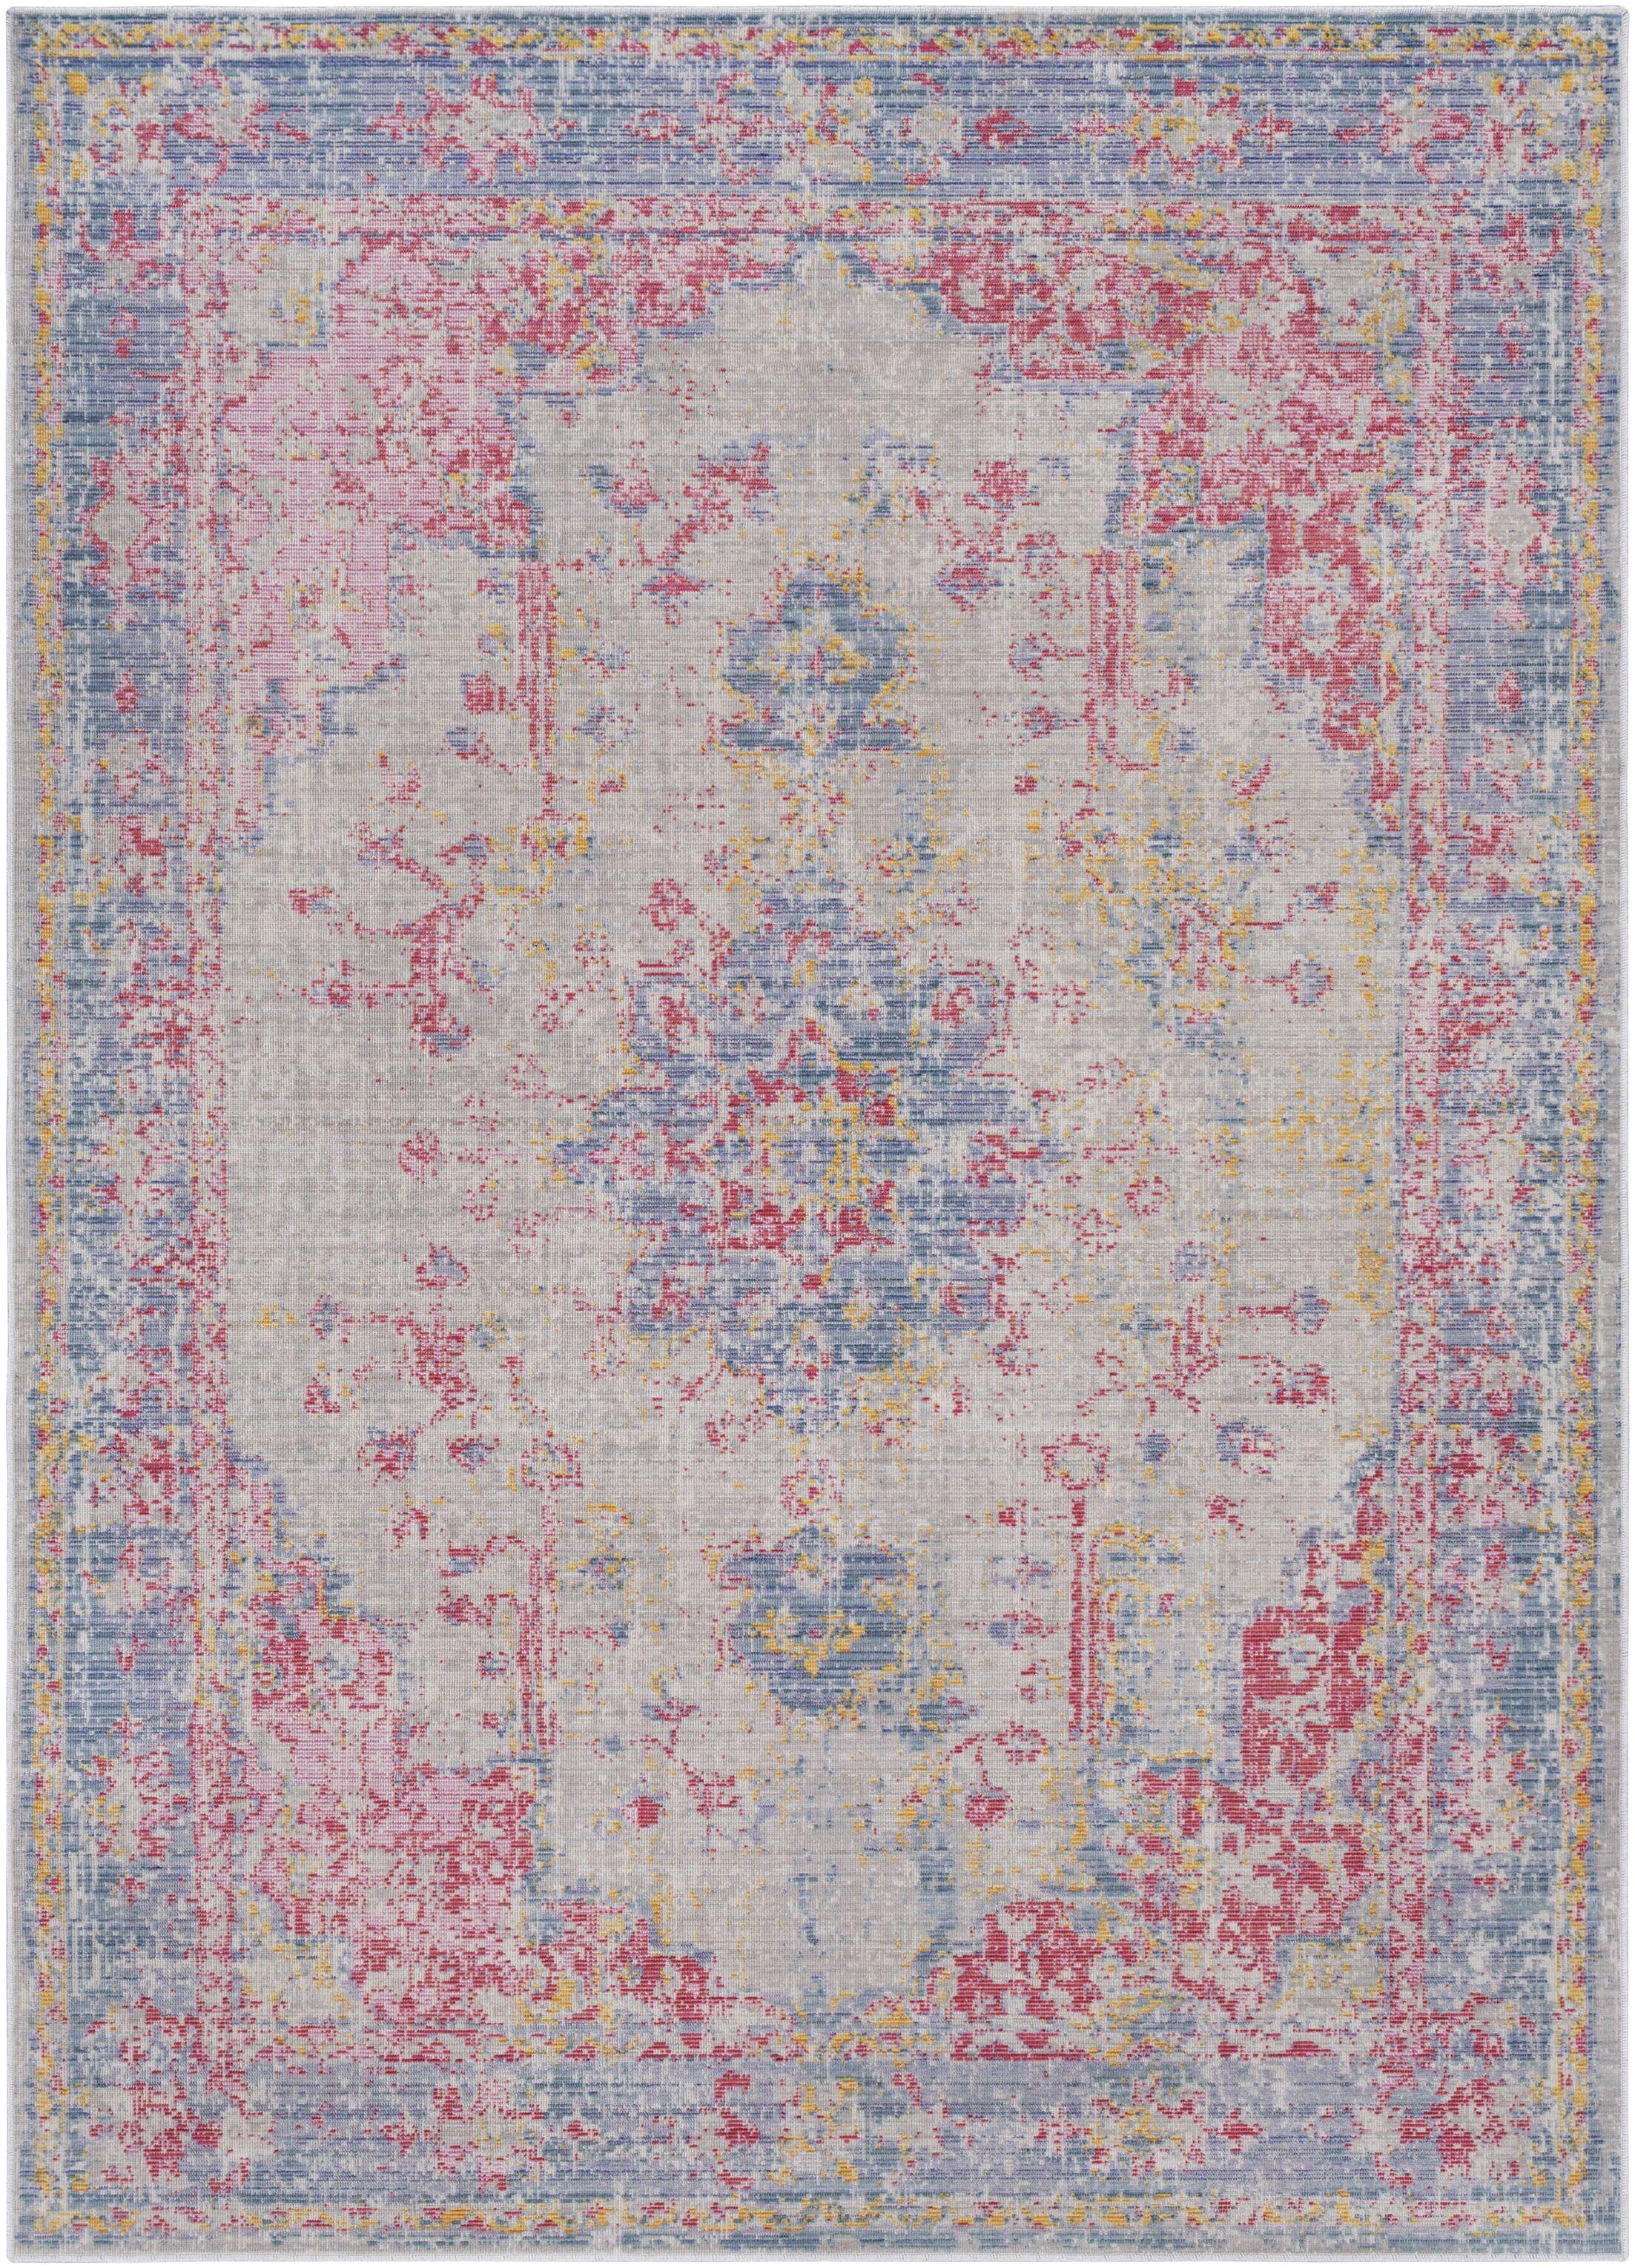 Kahina Vintage Distressed Oriental Pink/Blue Area Rug Rug Size: Rectangle 5'3